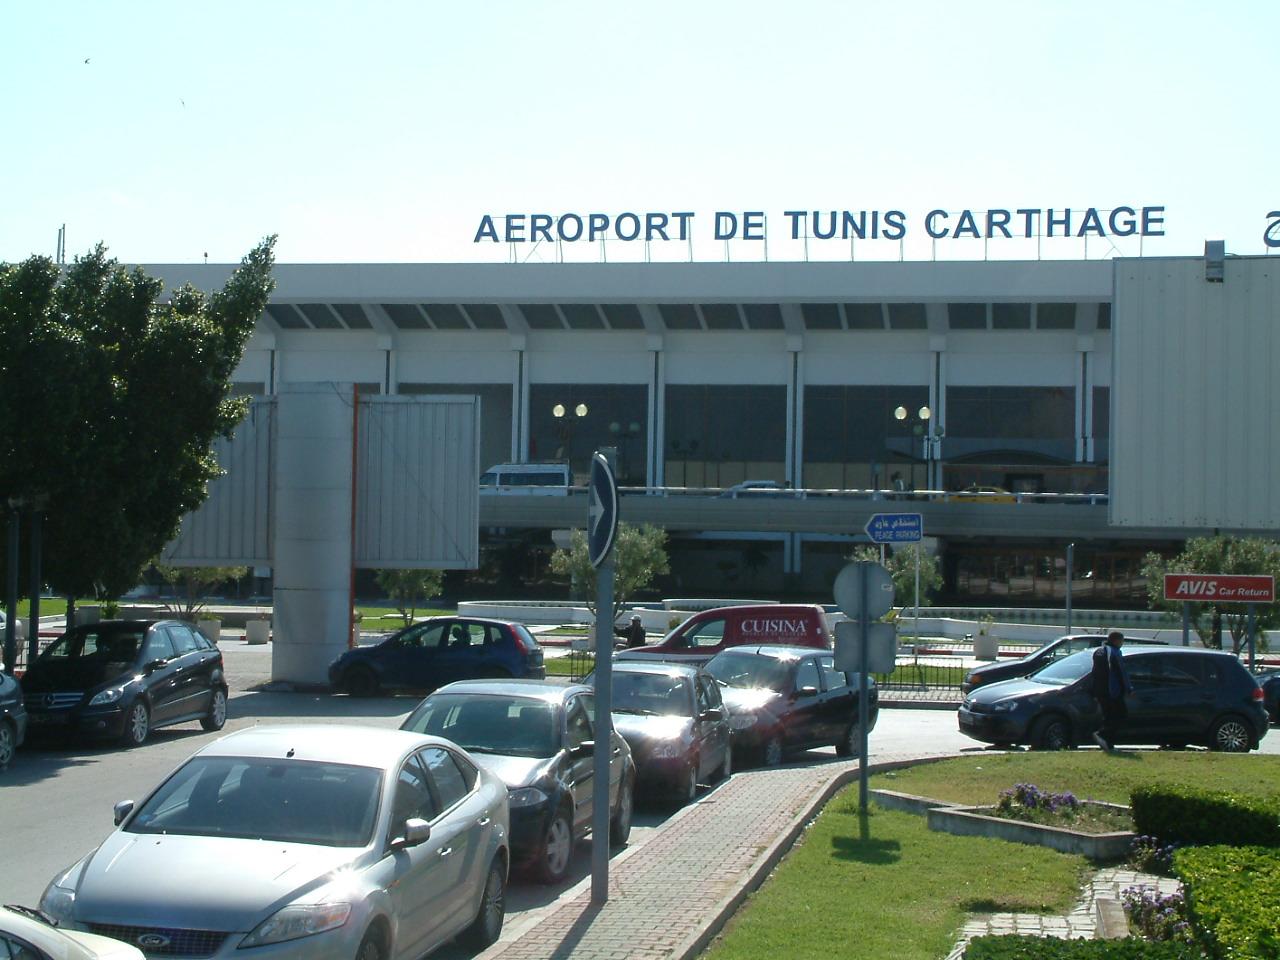 2 mei 2009 Tunis – Amsterdam